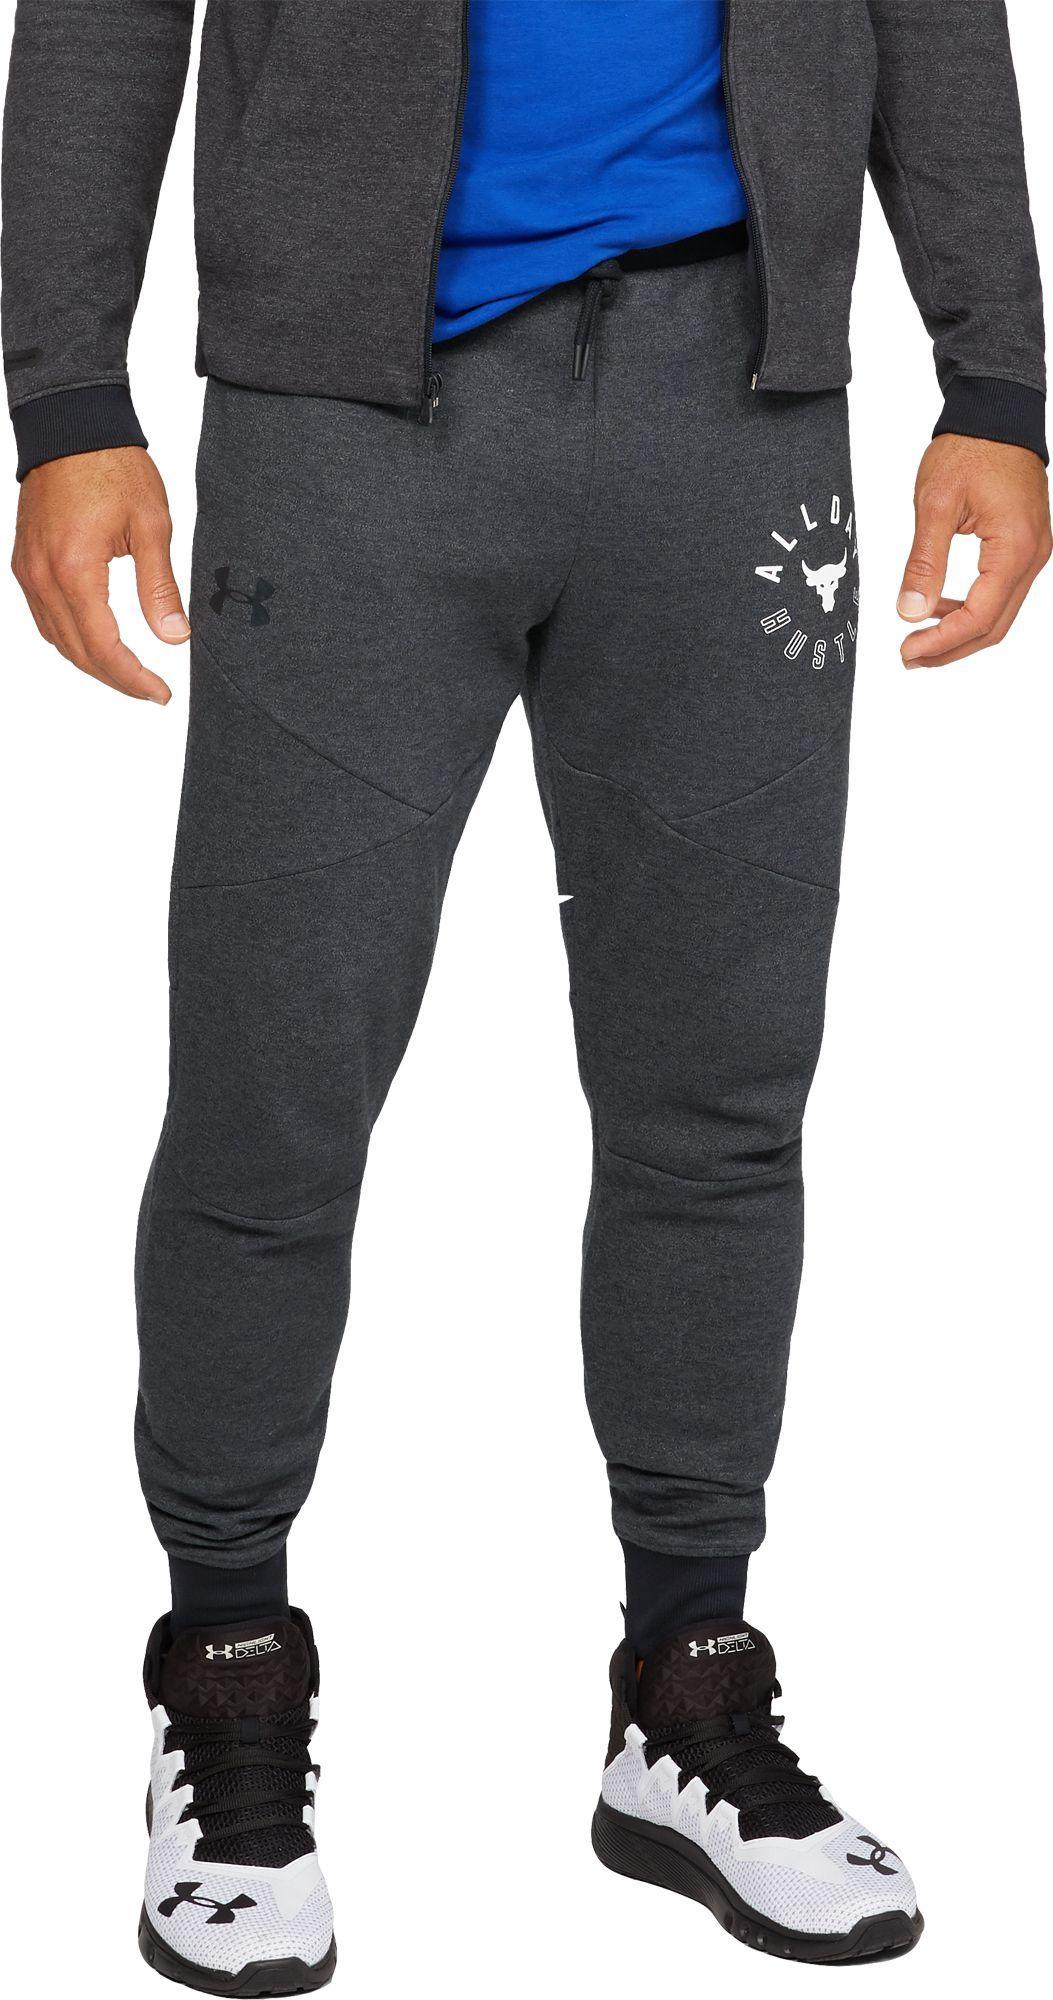 Under Armour Men S Project Rock Double Knit Joggers Black Athletic Outfits Under Armour Gym Wear Men